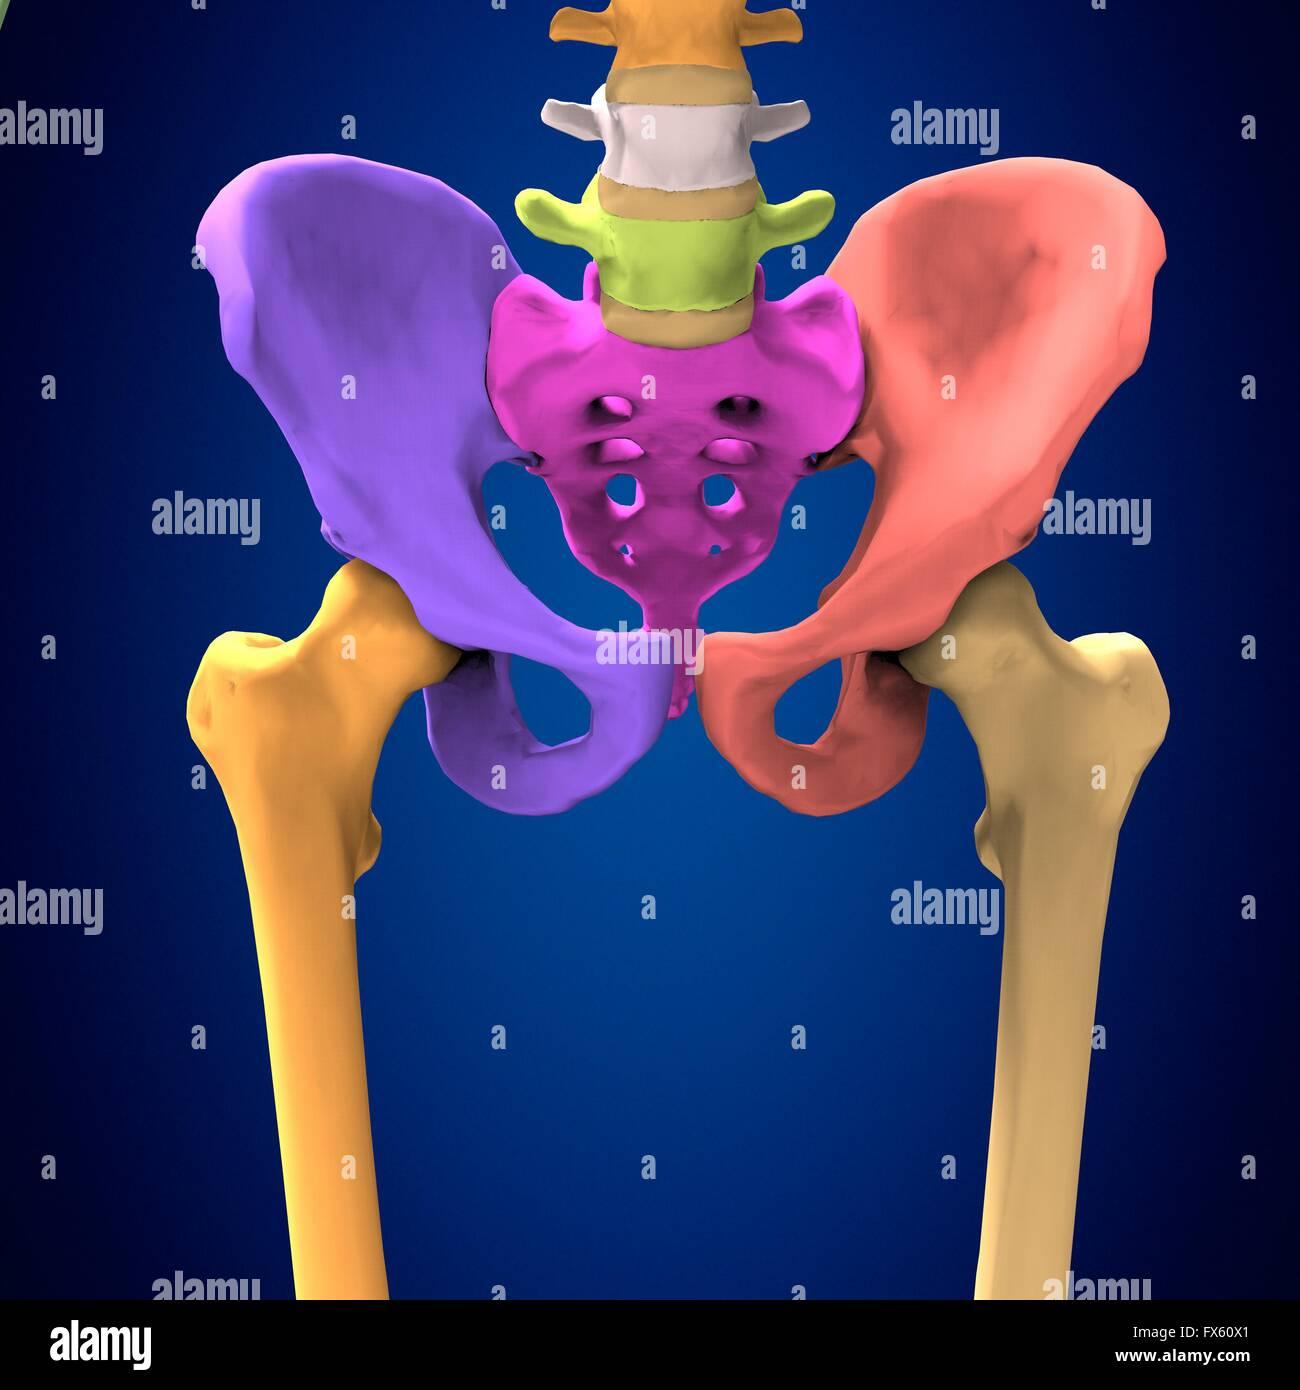 human body hips - Stock Image